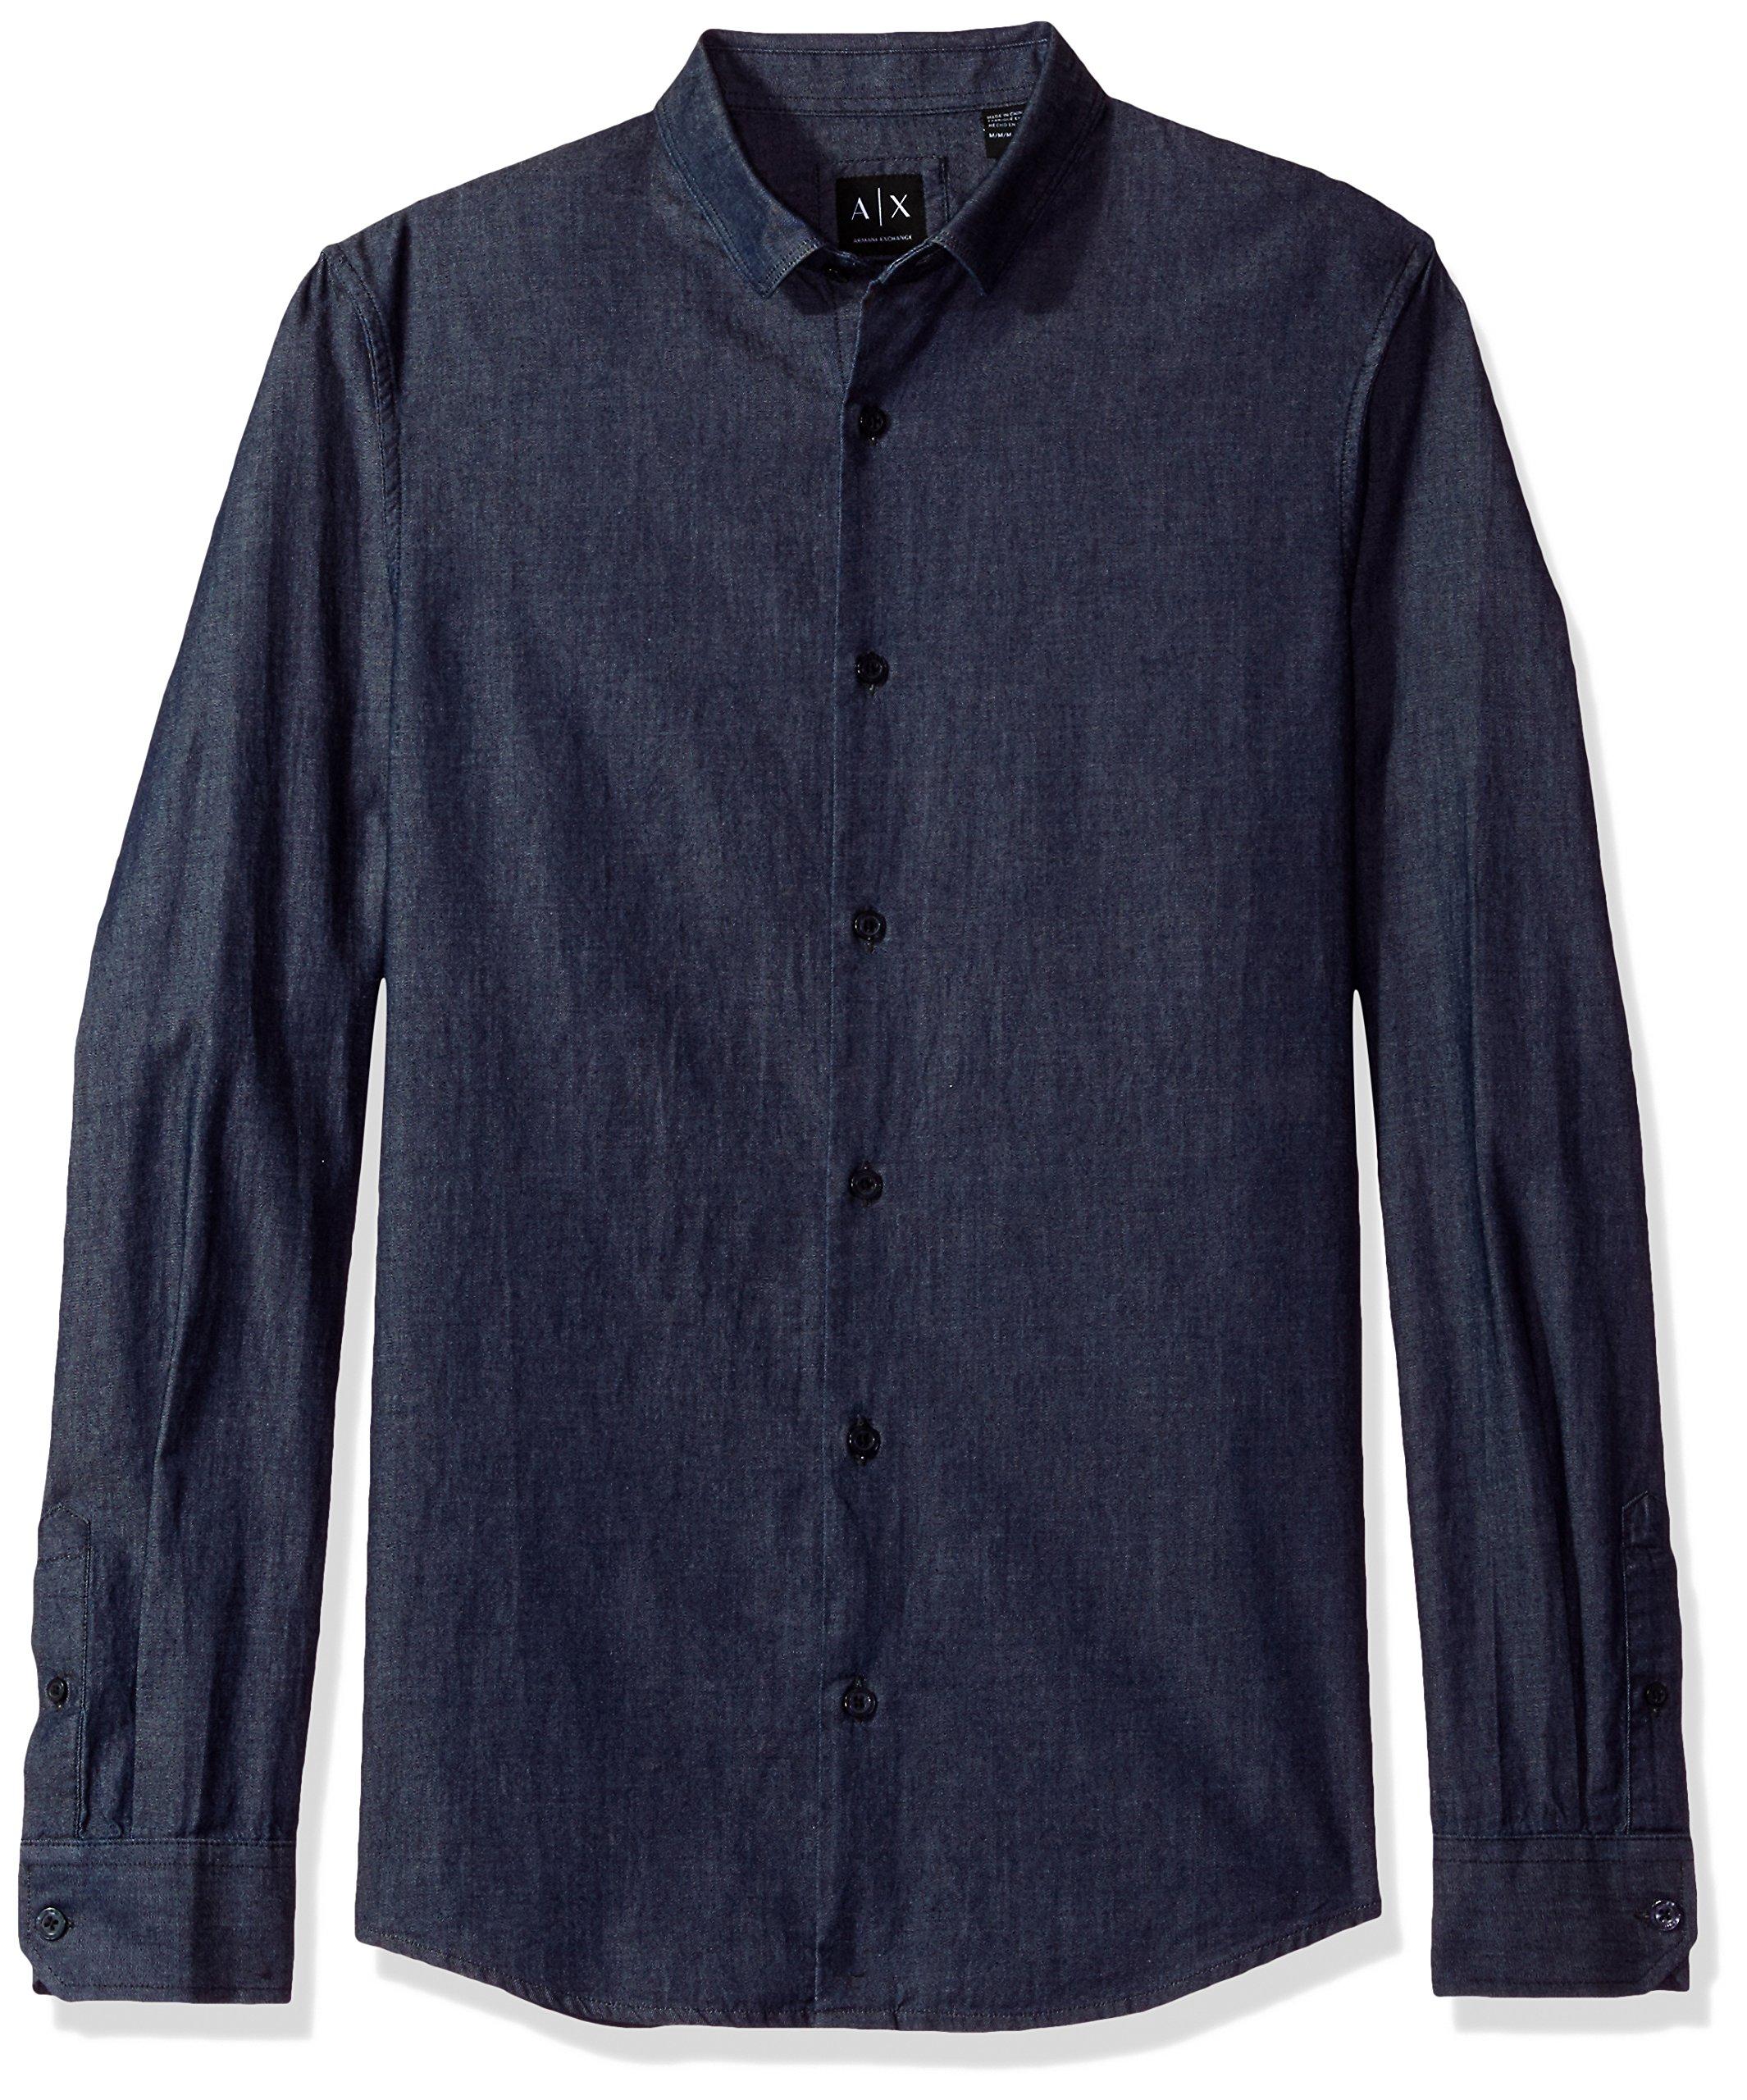 A X Armani Exchange Men's Denim Long Sleeve Collared Button up Reg Fit, Indigo, Large